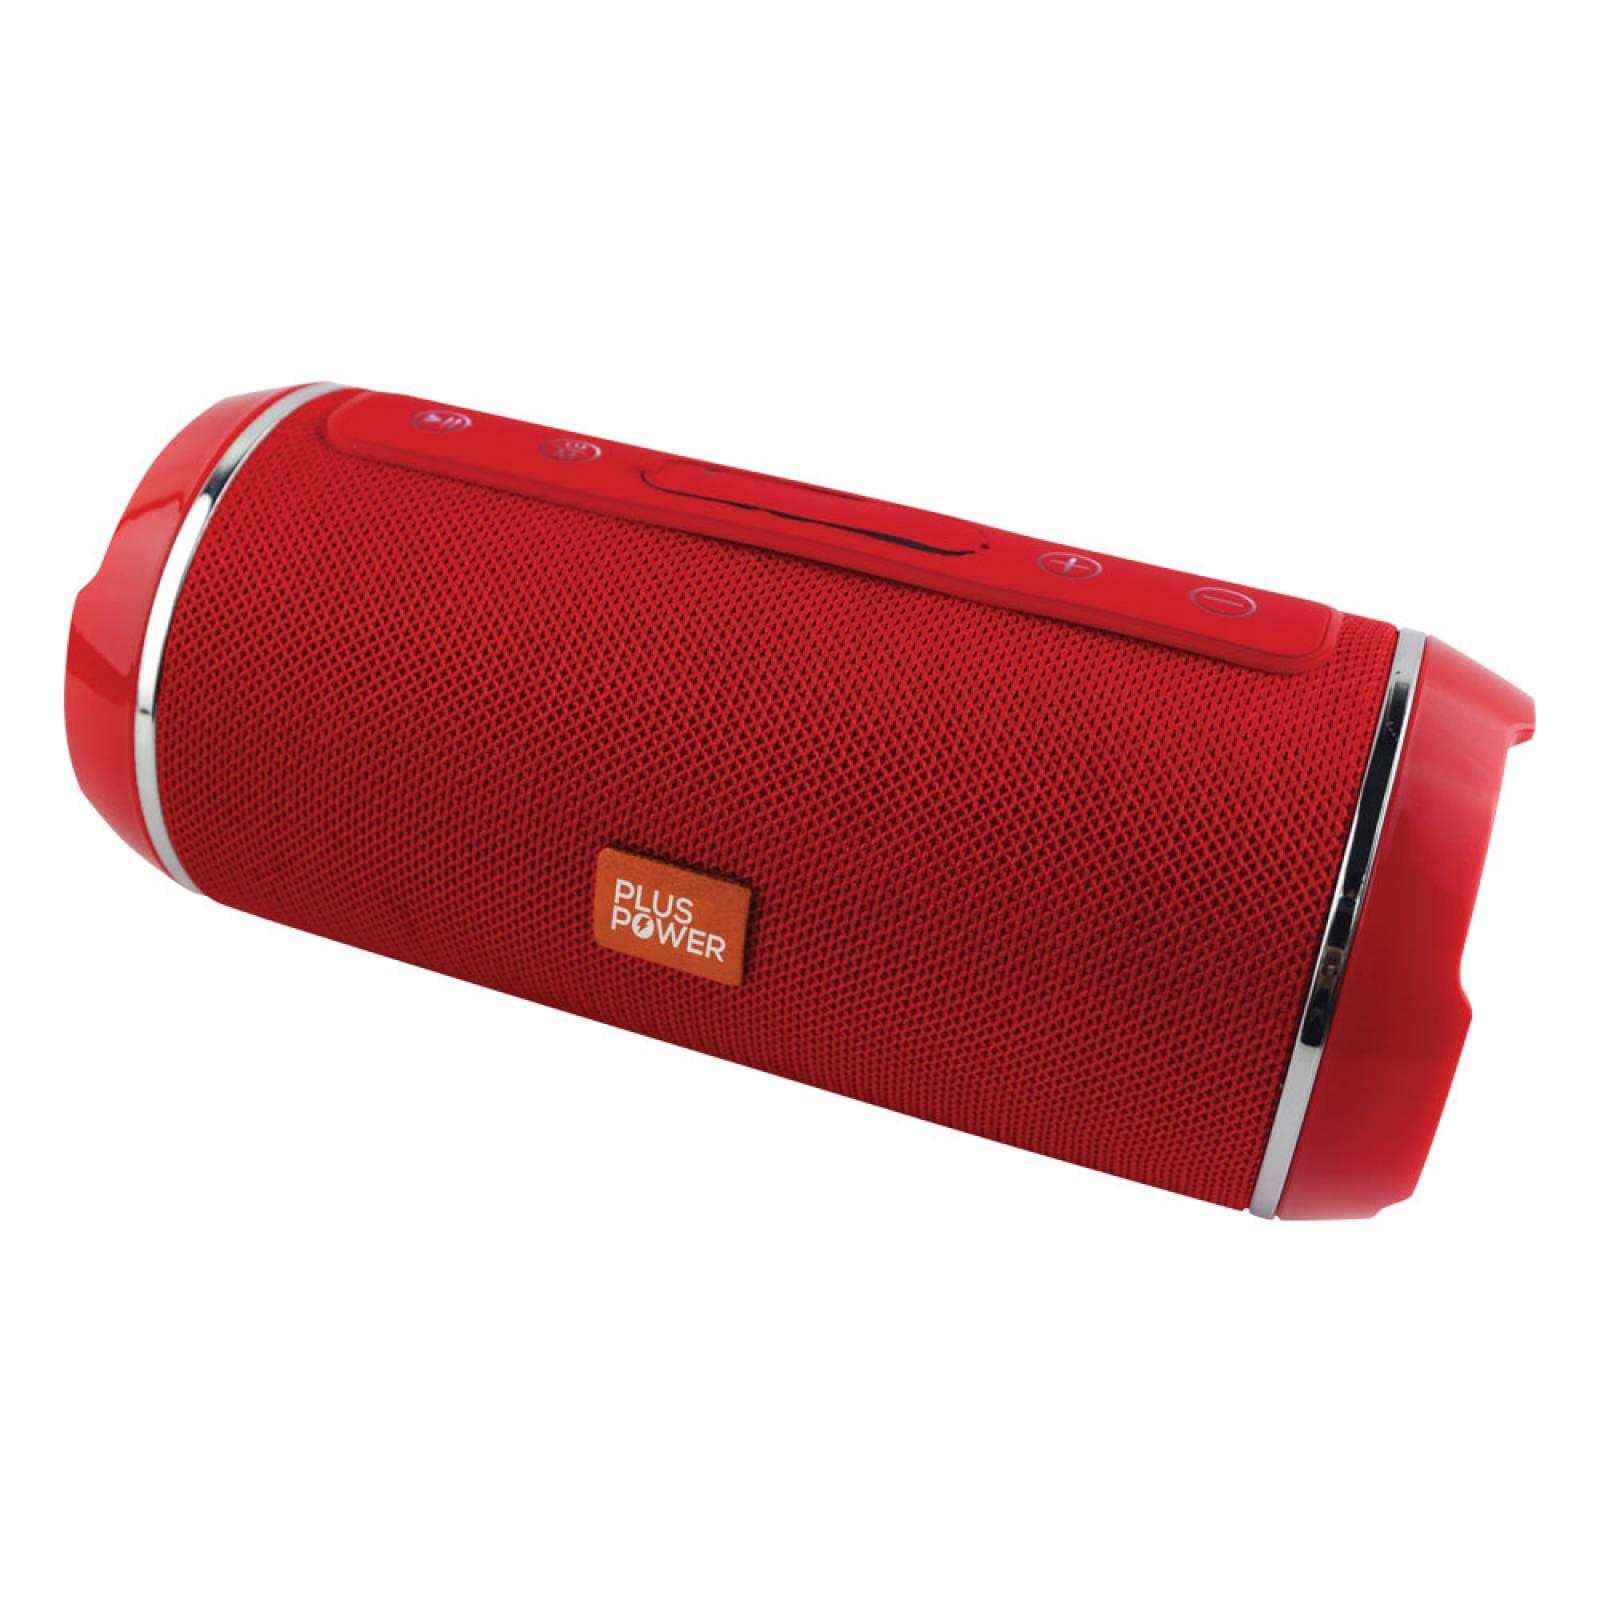 Bocina Bluetooth Portatil Extra Bass Plus Power Sbt107  Roja